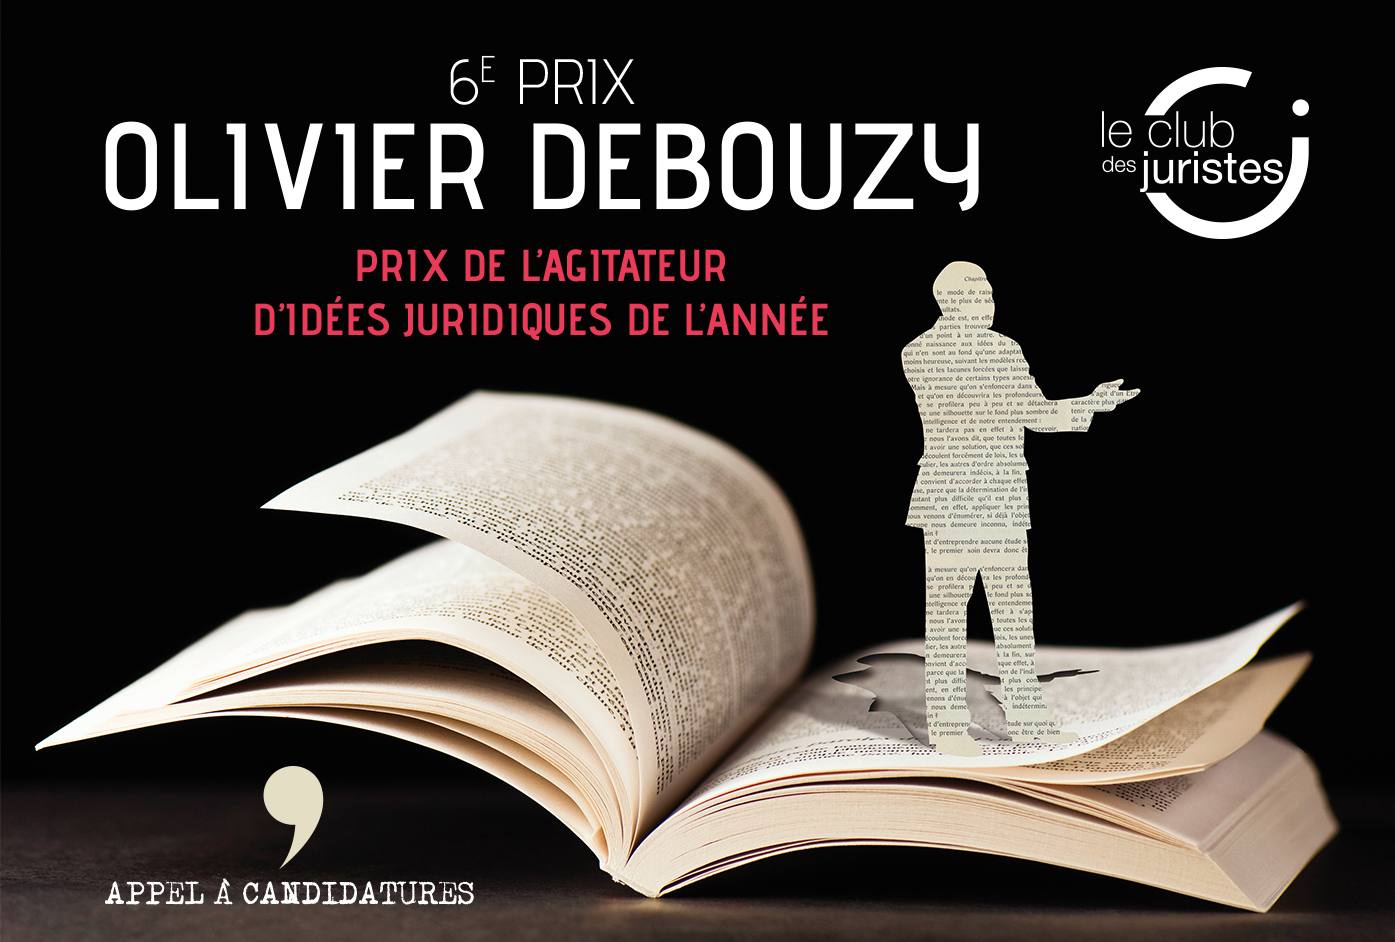 CDJ_6e-Prix-Olivier-Debouzy_1395x942